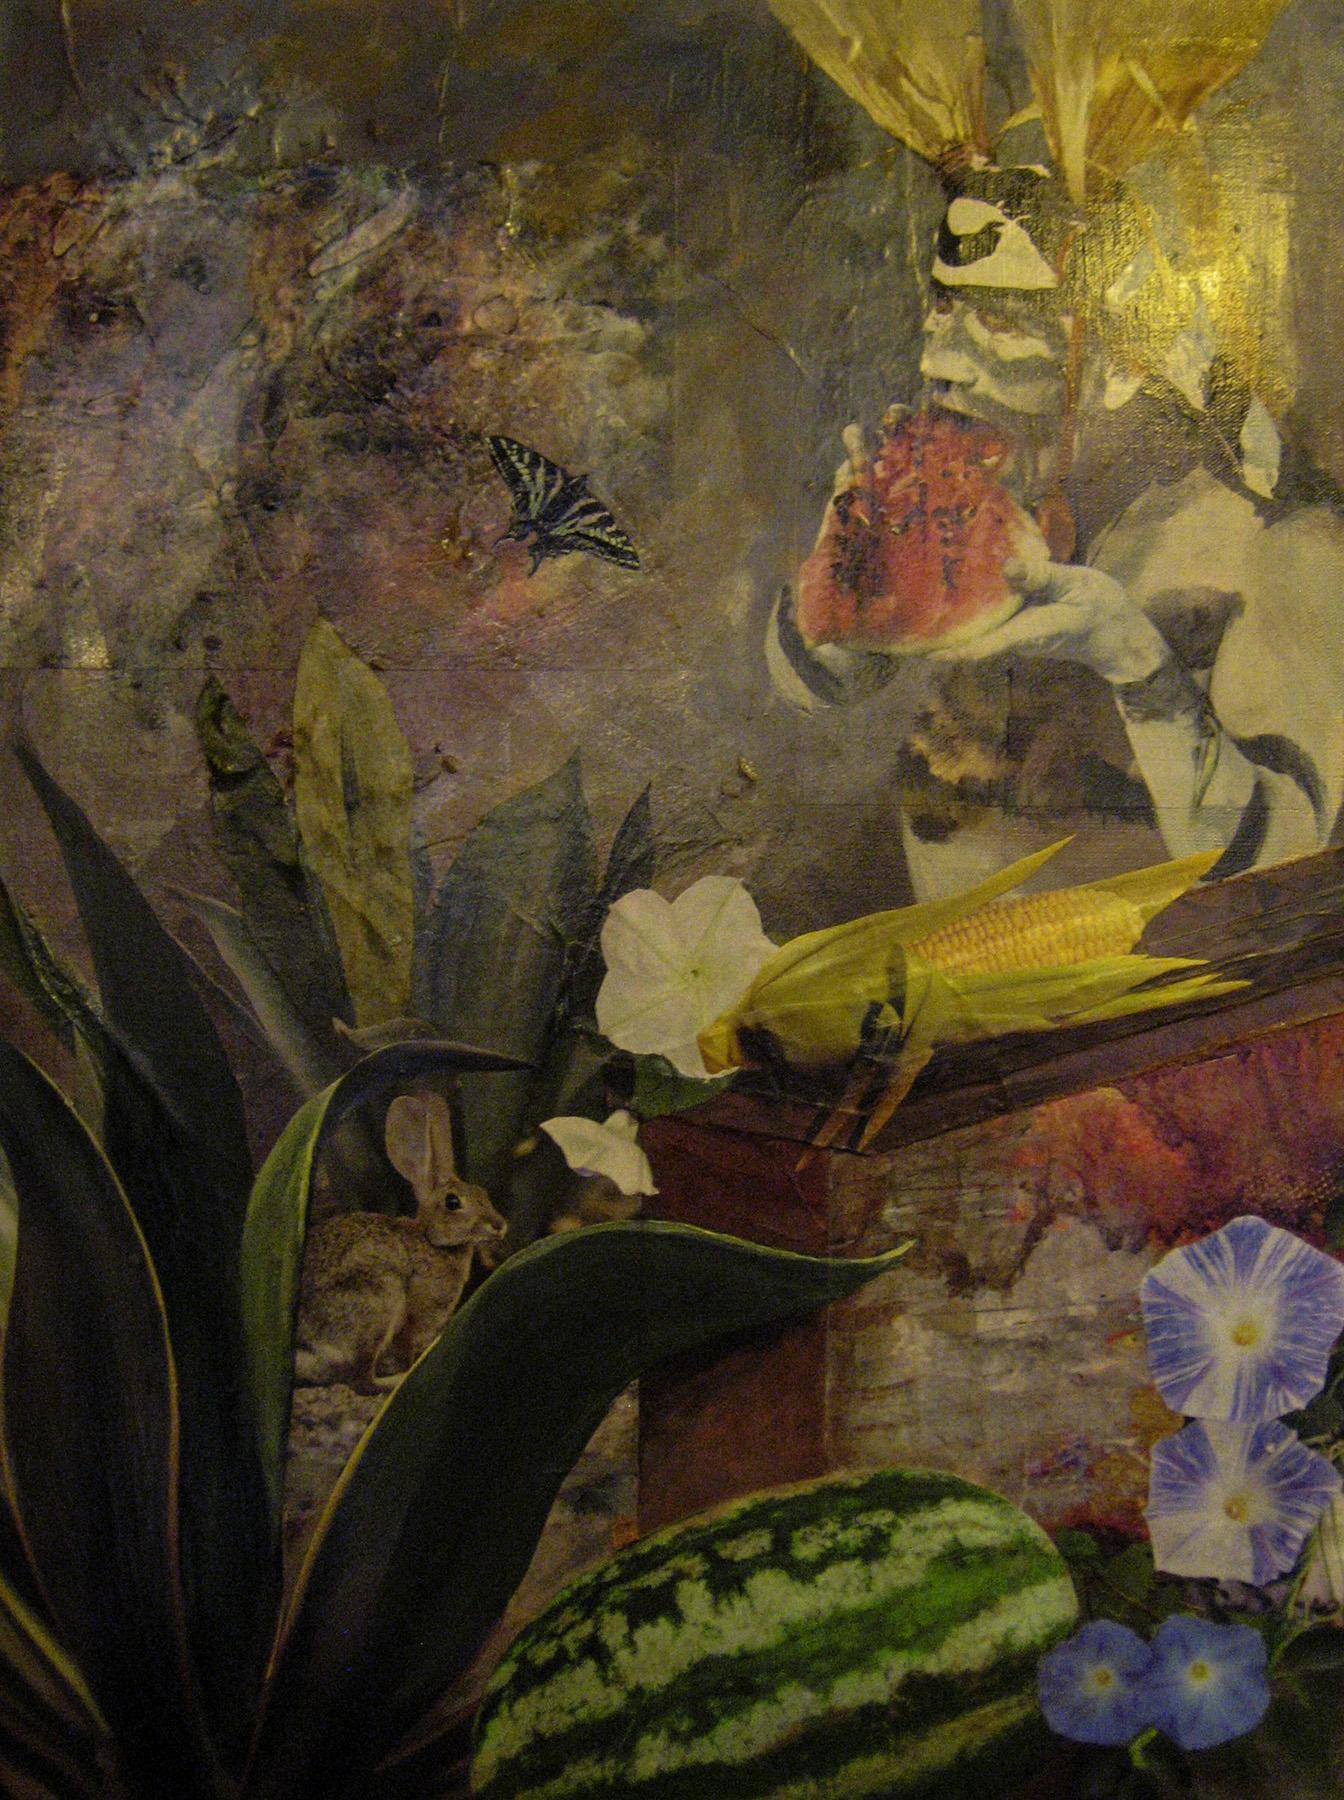 Artworks by Emilie Munsch